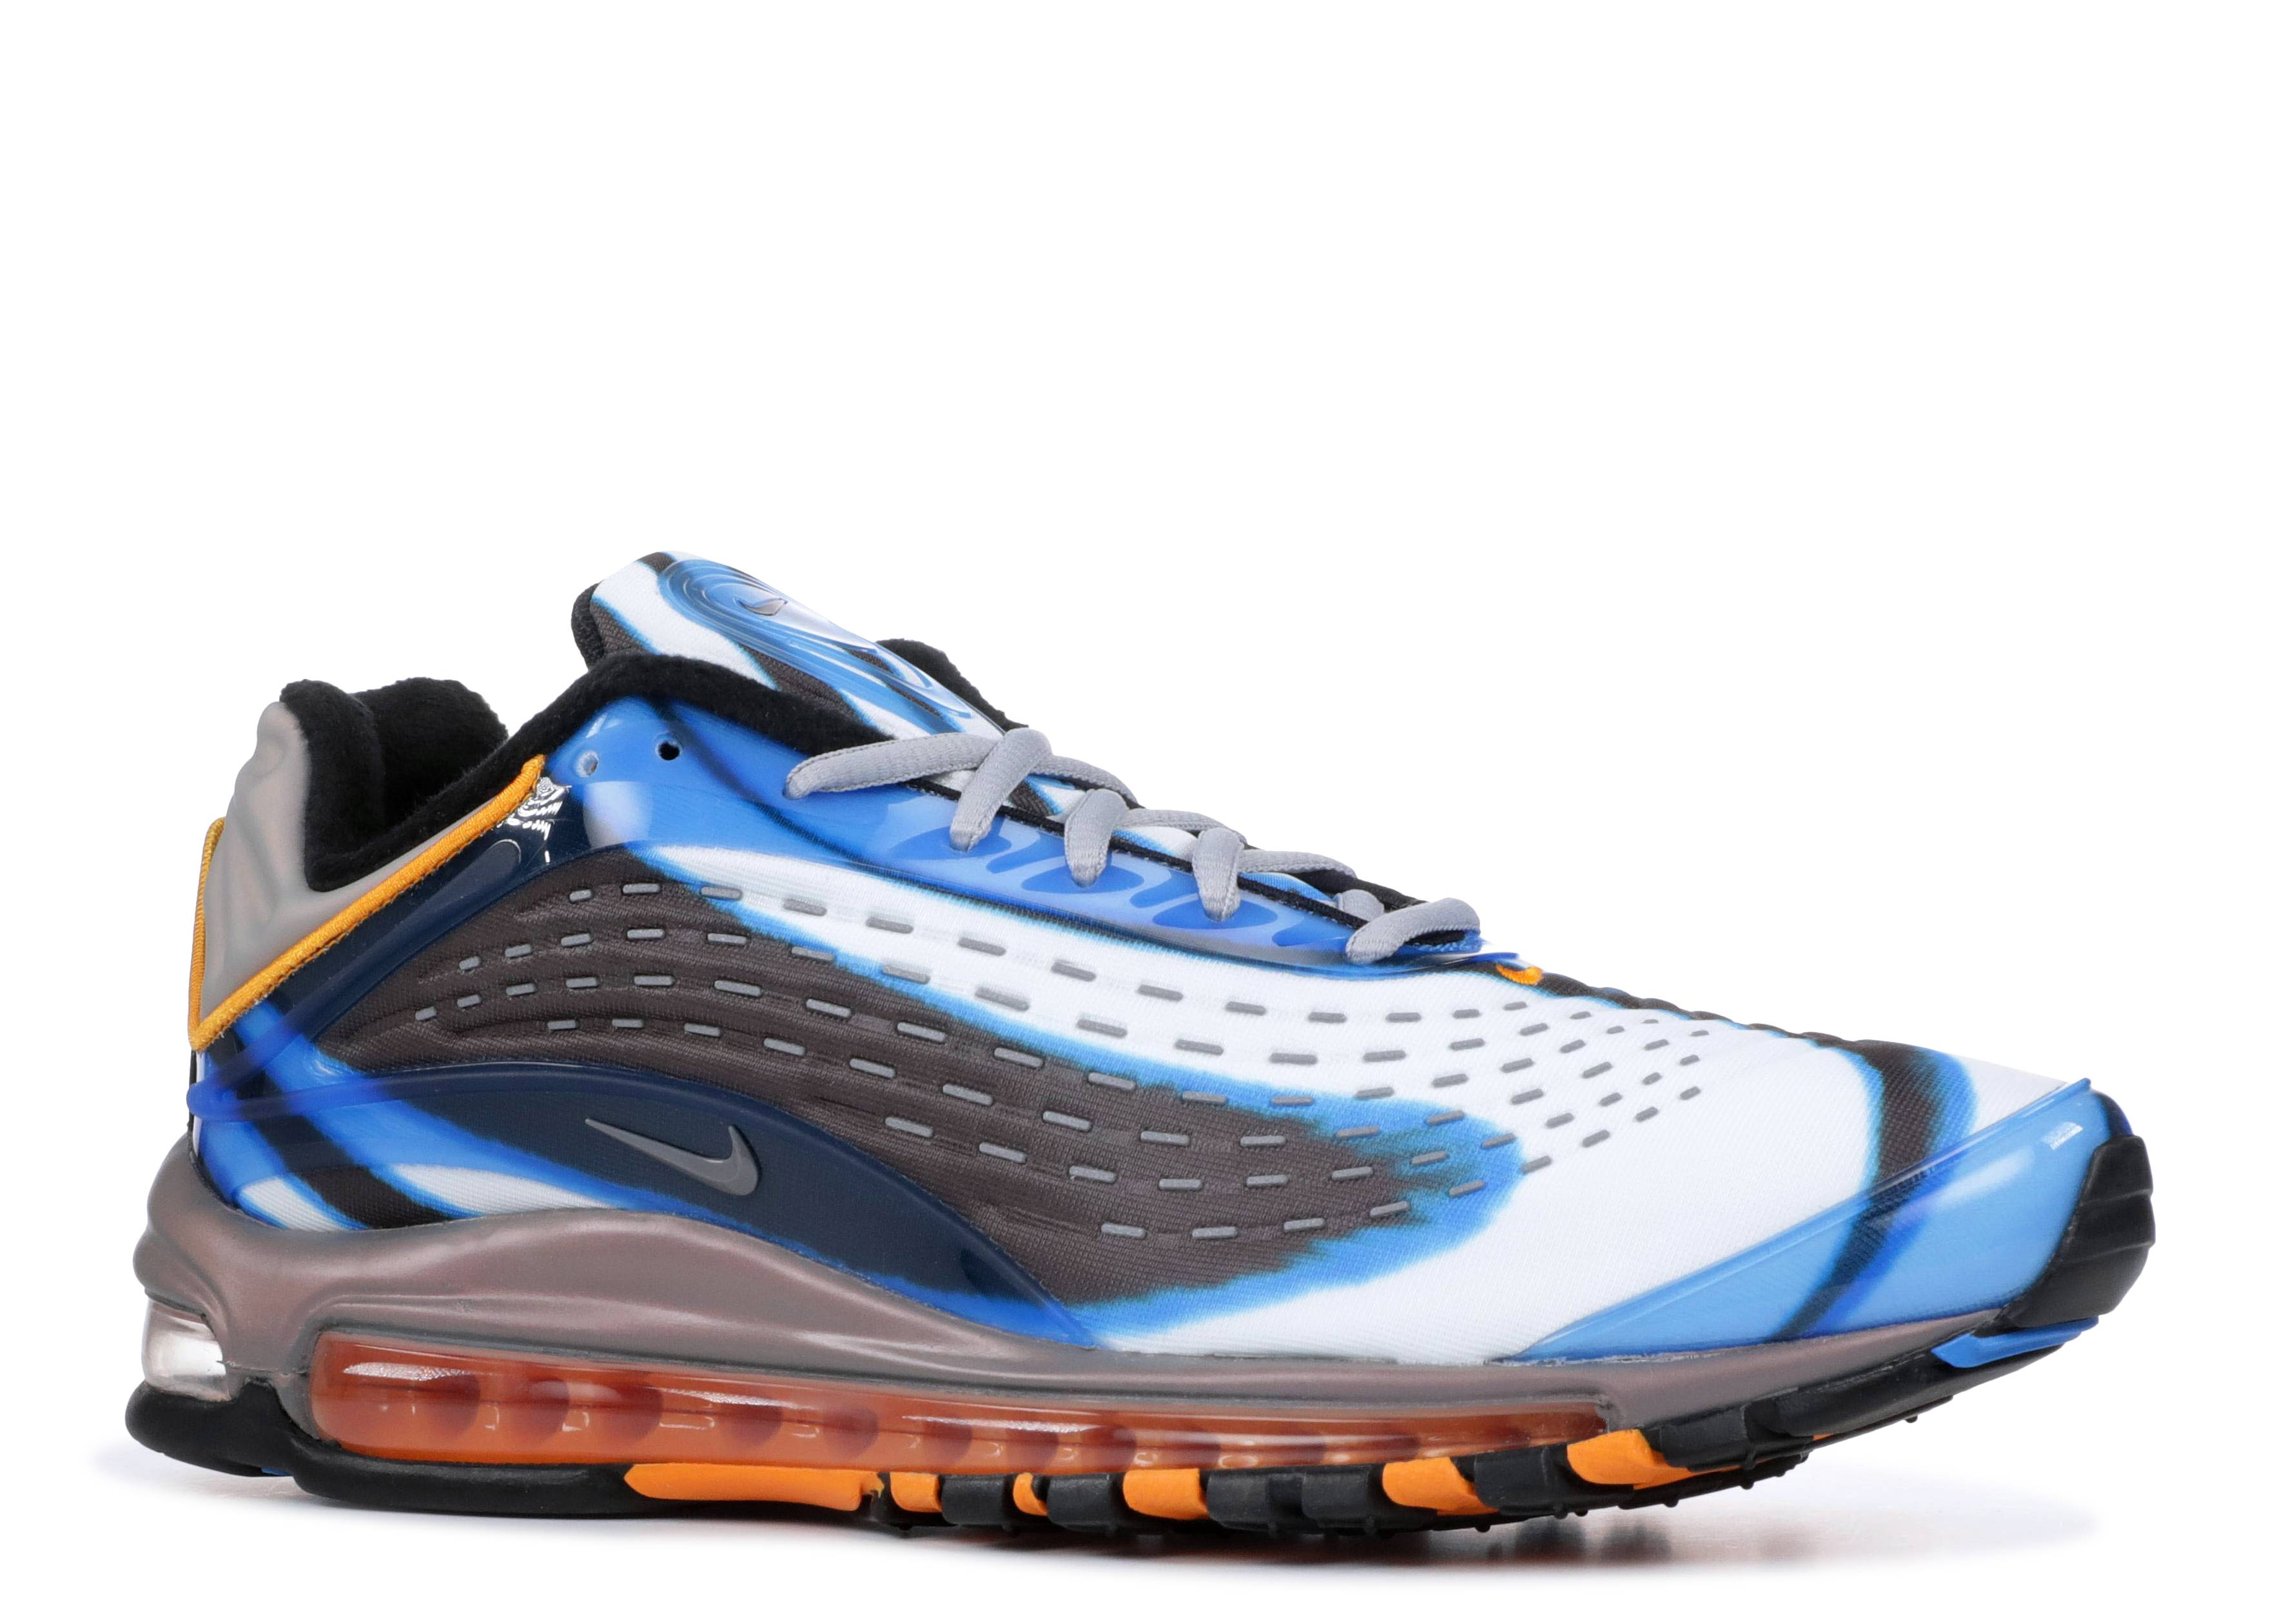 155a9963c198 Nike Air Max Deluxe - Nike - AJ7831 401 - photo blue wolf grey-orange peel- black